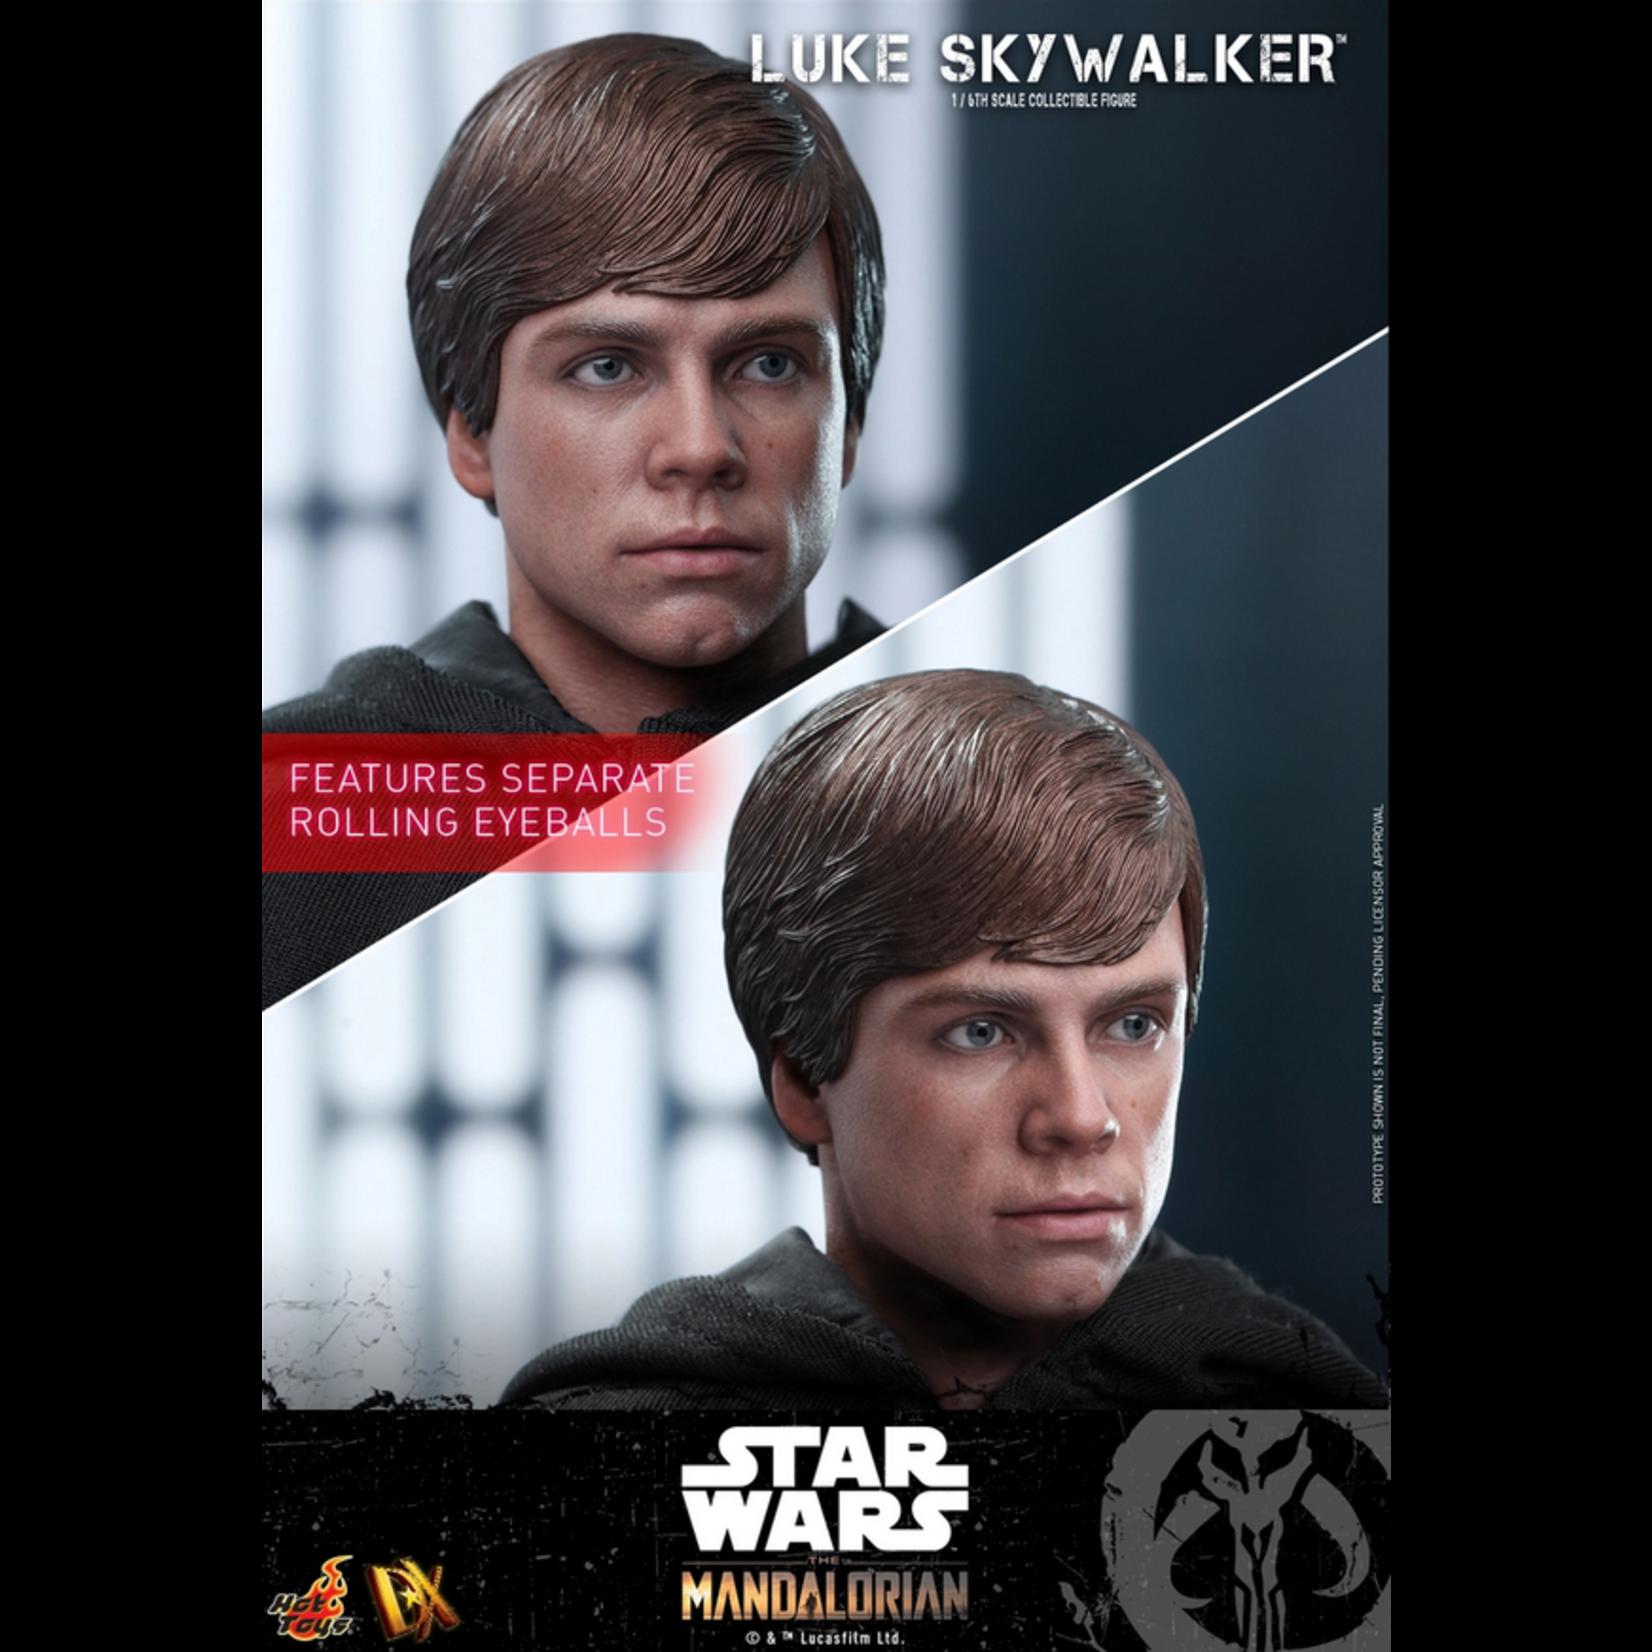 Hot Toys [Preorder] Hot Toys DX22 Star Wars: The Mandalorian™ Luke Skywalker Deluxe Version